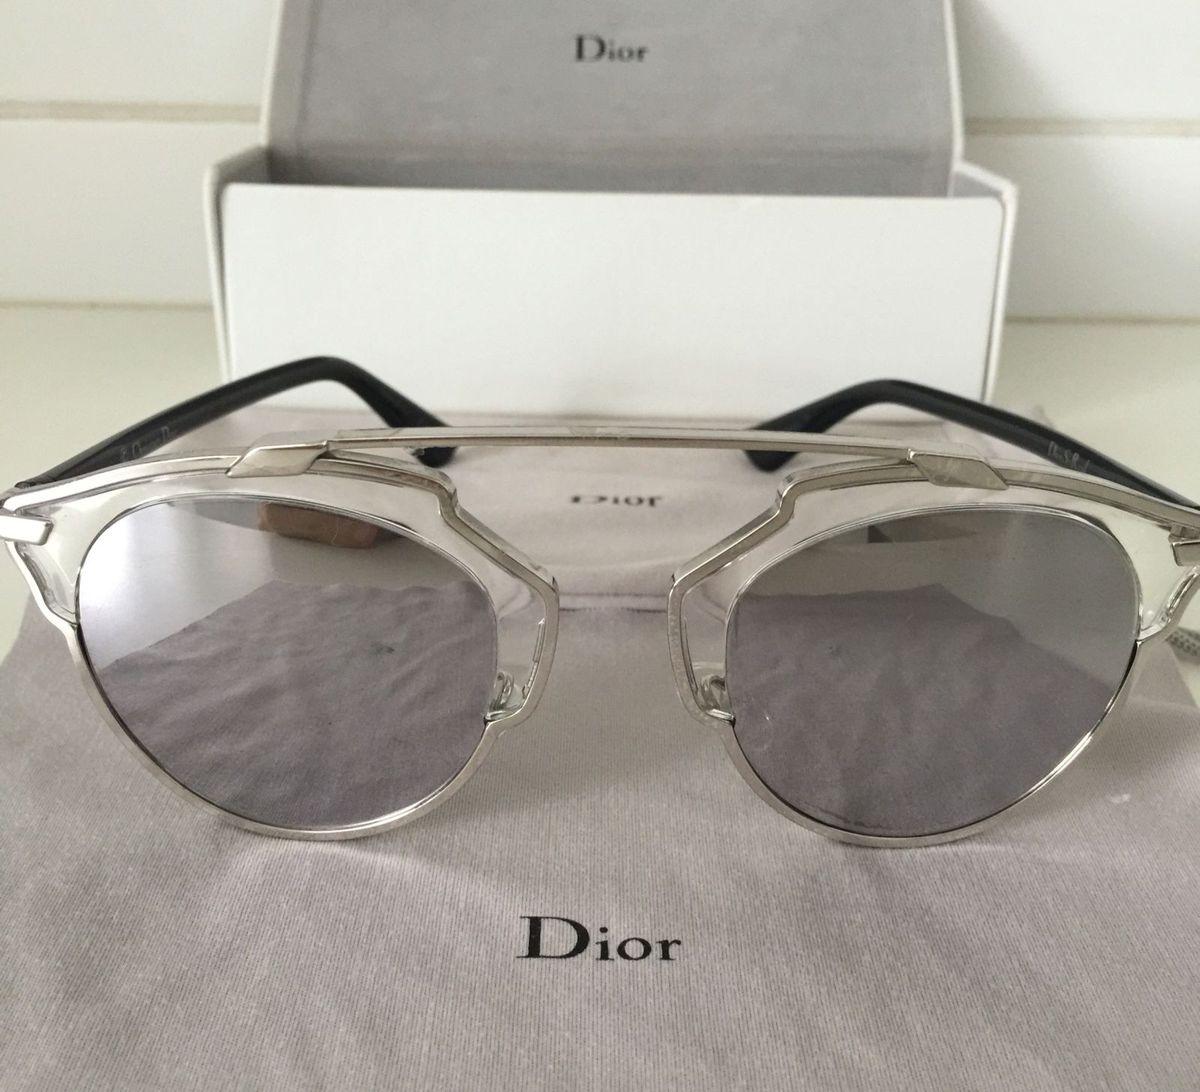 oculos christian dior so real - óculos dior.  Czm6ly9wag90b3muzw5qb2vplmnvbs5ici9wcm9kdwn0cy85nji1oty3lzfizthim2uzytc0y2jjodm4zjliyze0nzrhzwy4oguwlmpwzw  ... dafbd7ad0b